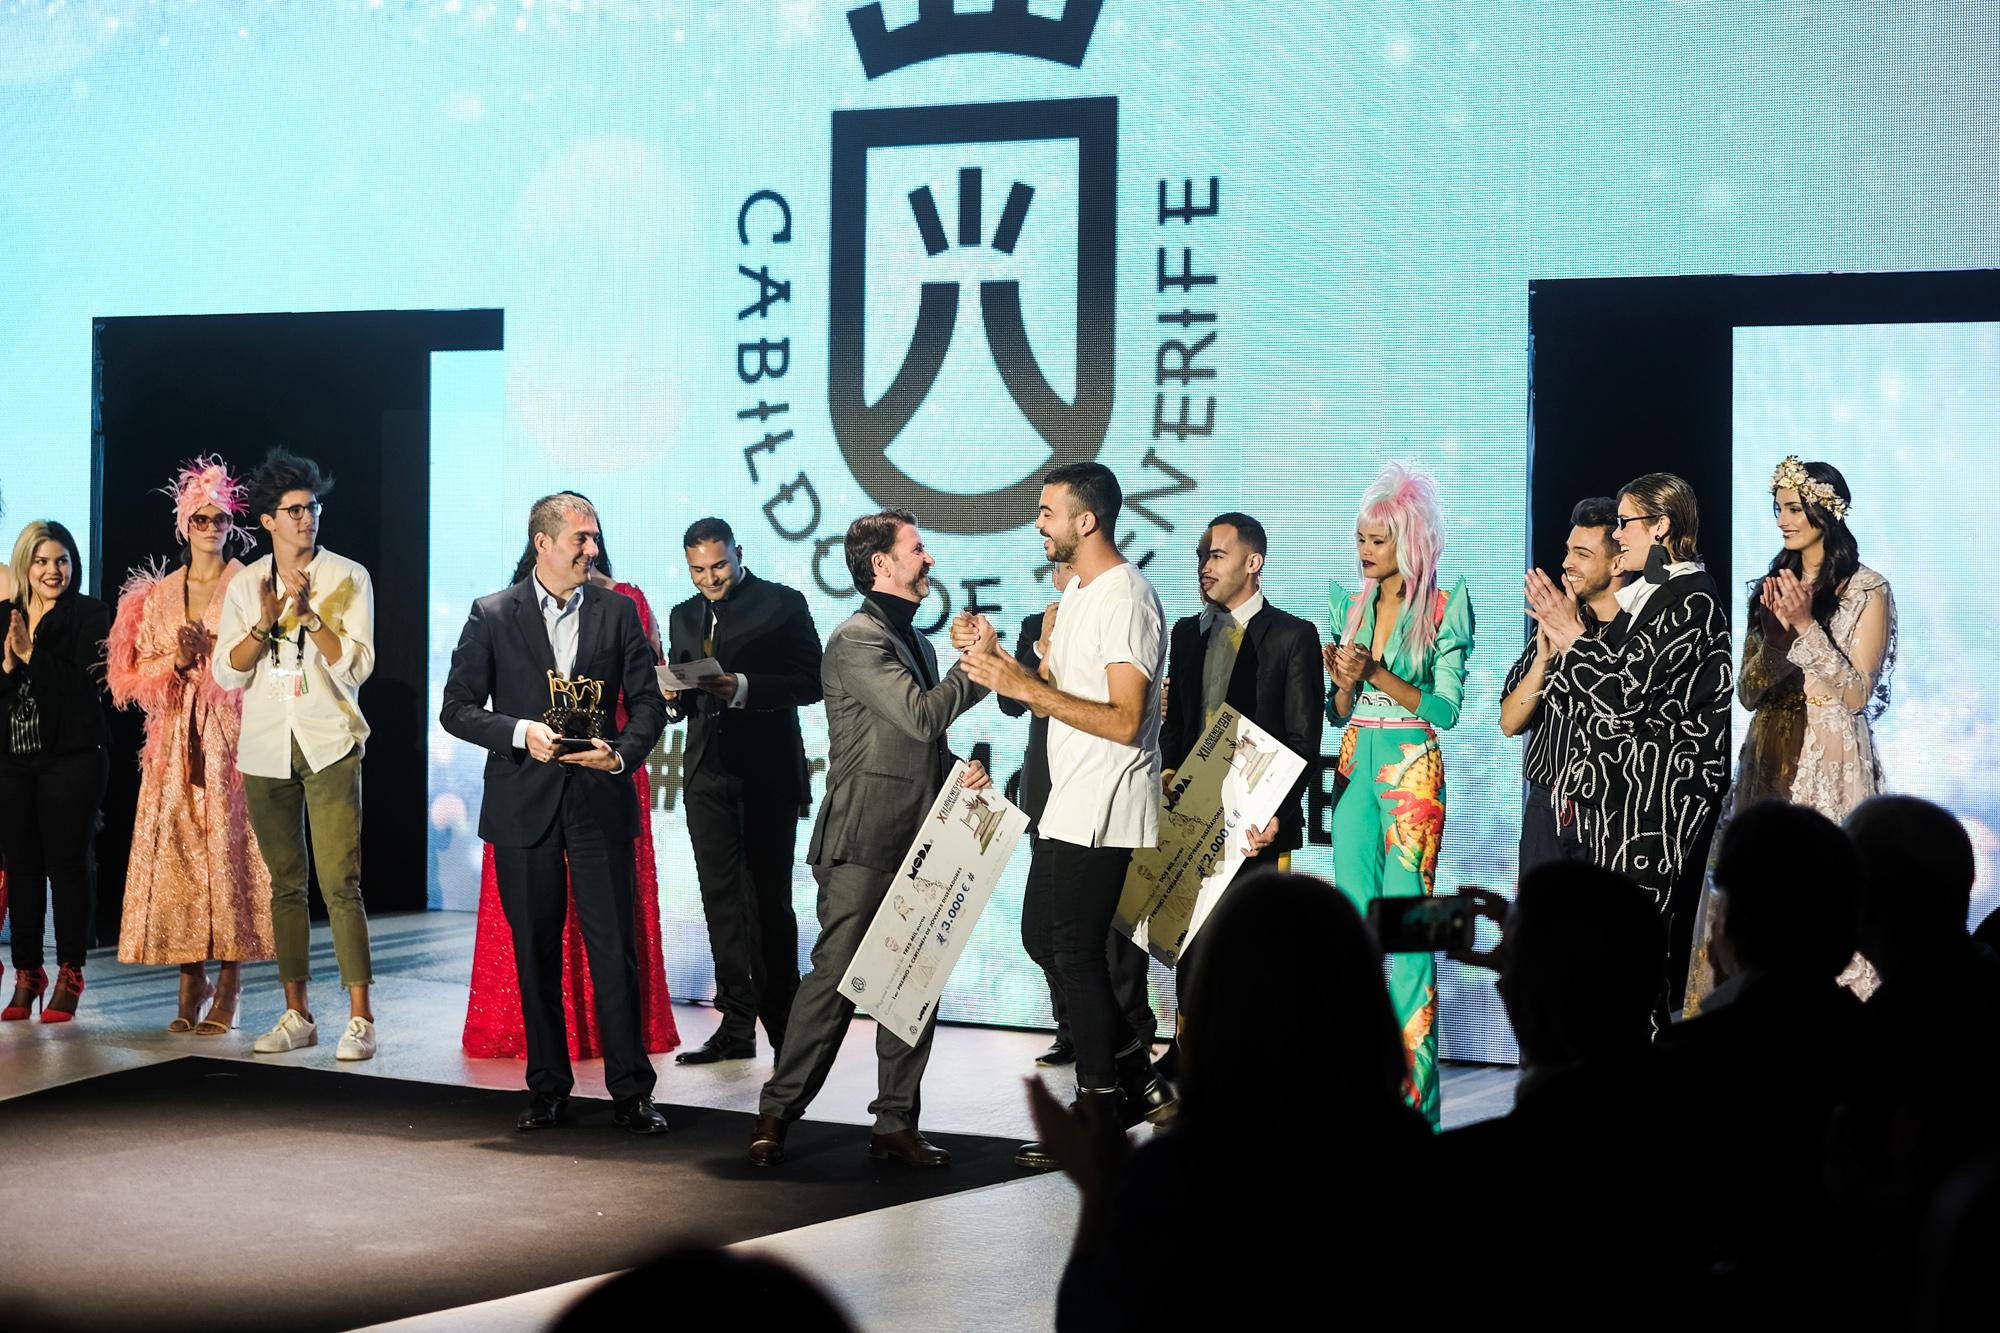 Premio Jovenes diseñadores Paco Naya-1.jpg